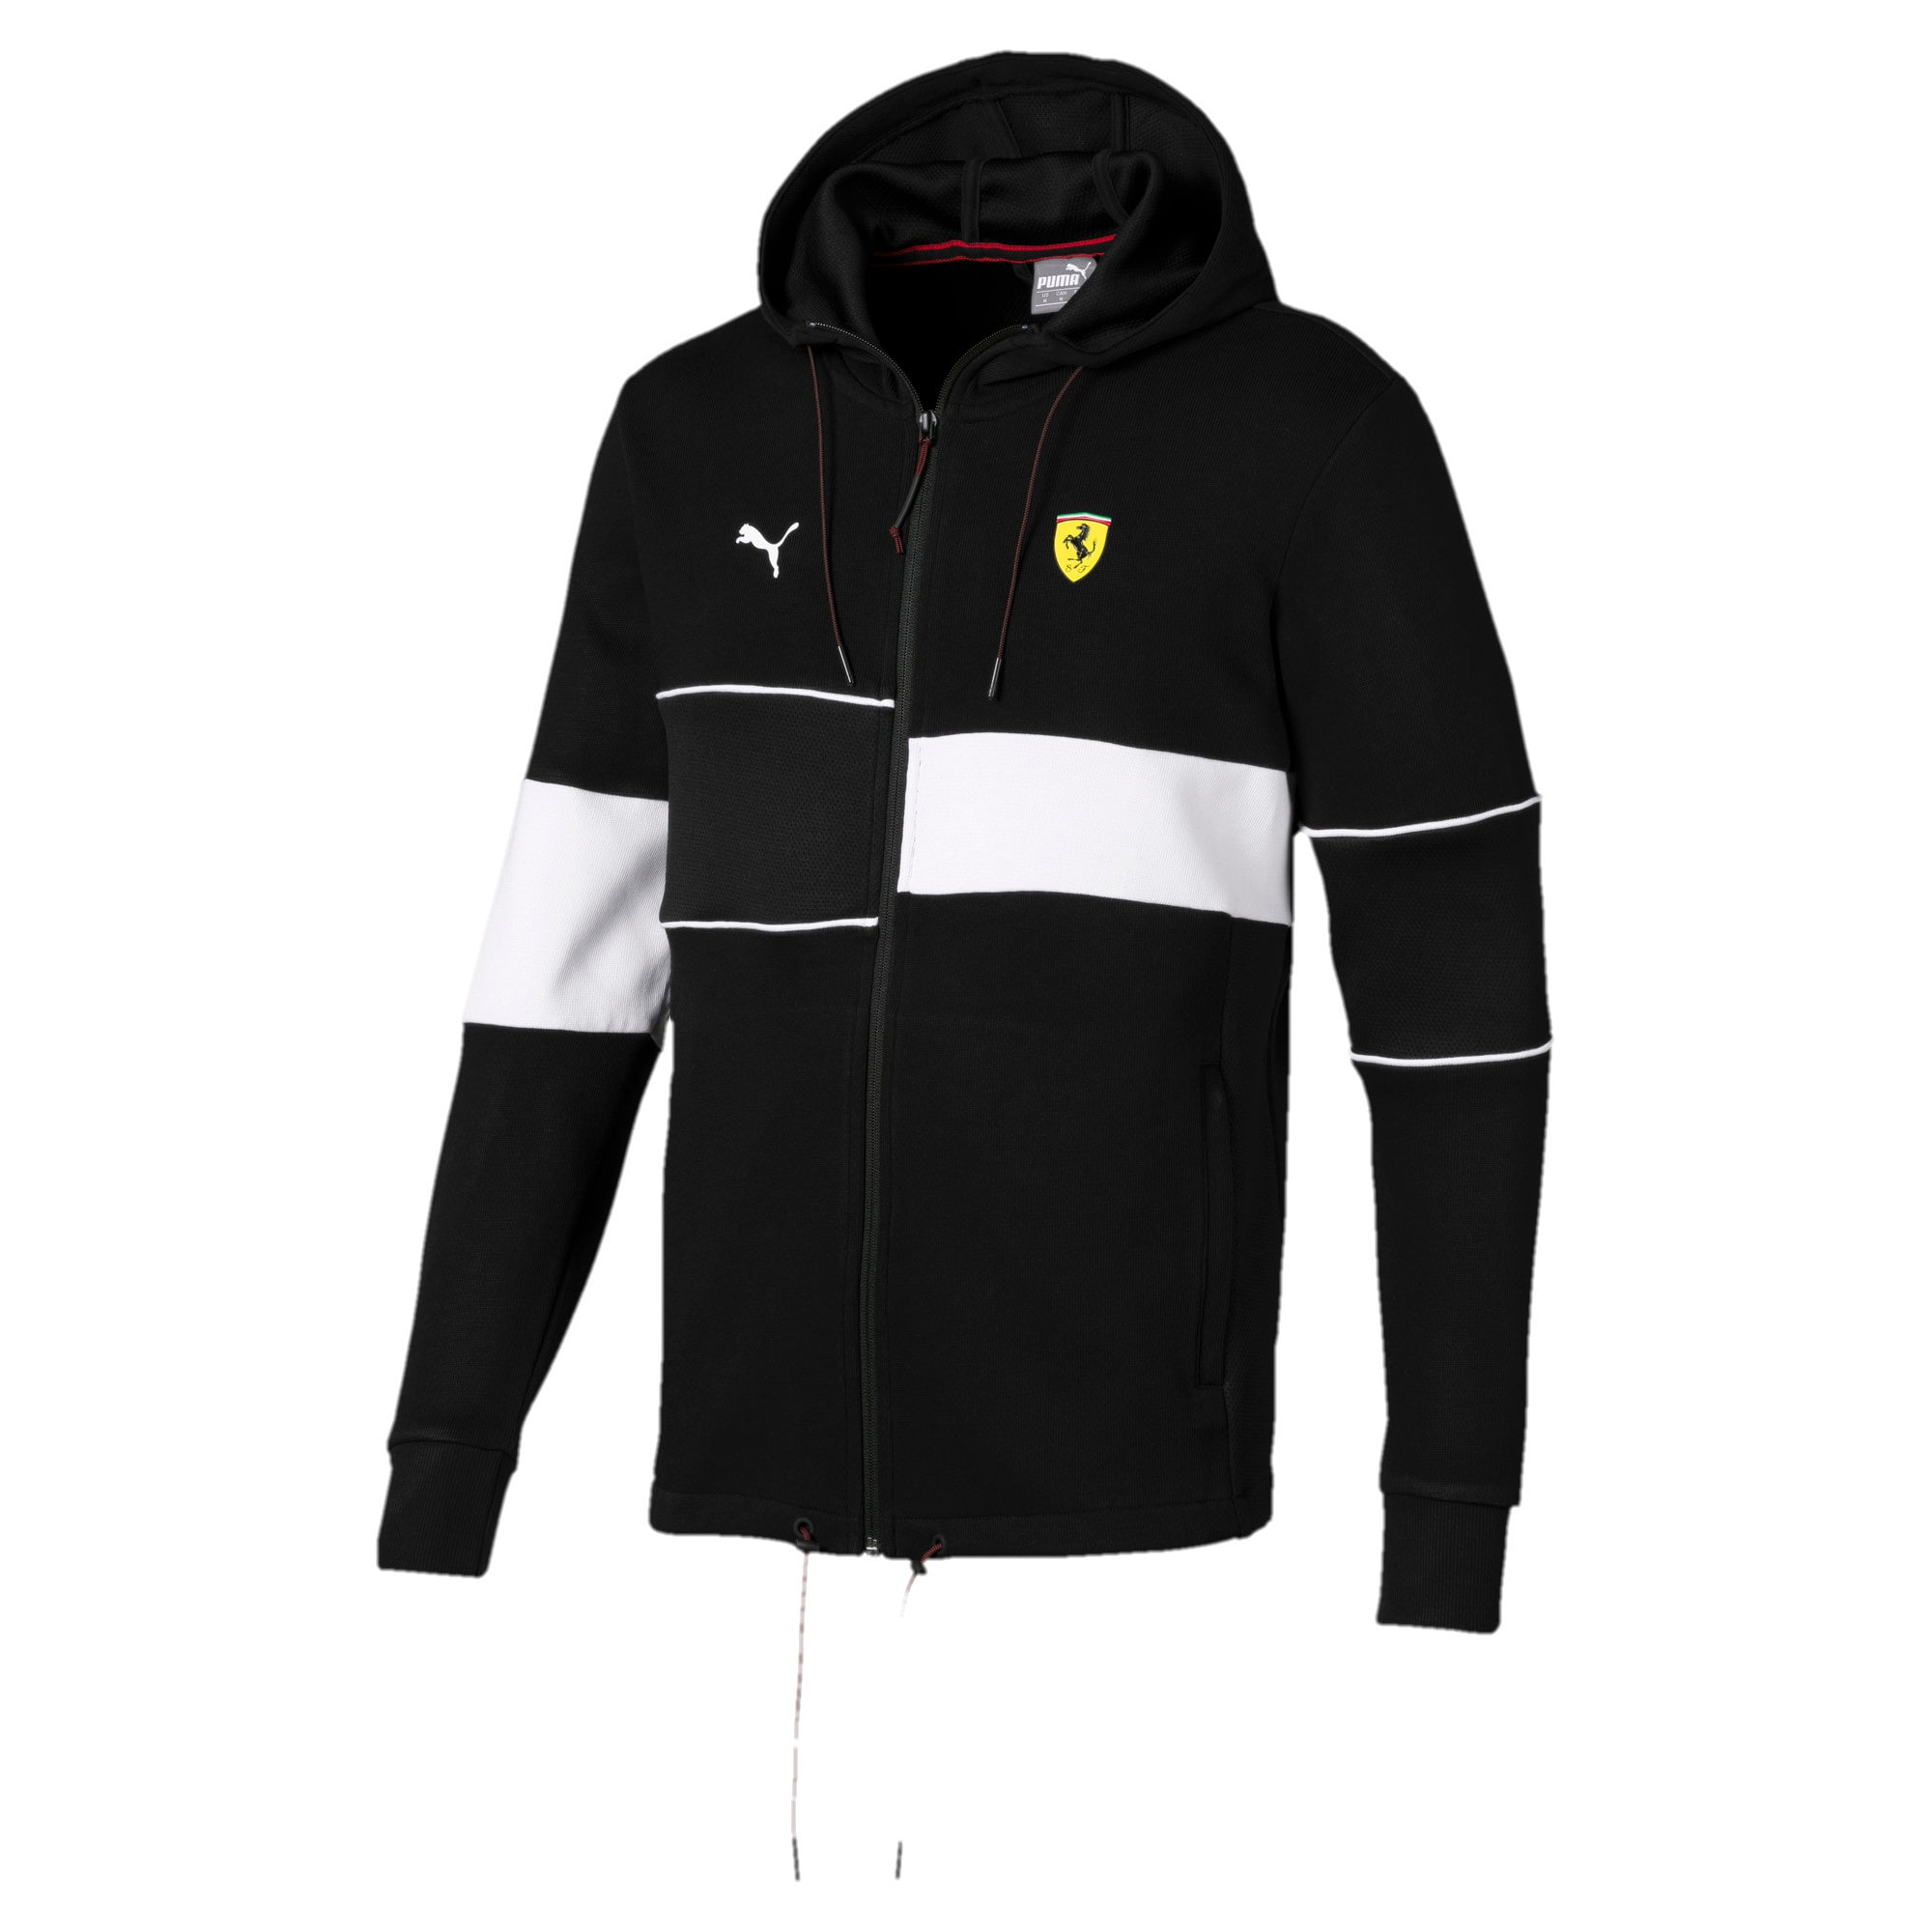 Thumbnail 4 of Scuderia Ferrari Men's Hooded Sweat Jacket, Puma Black, medium